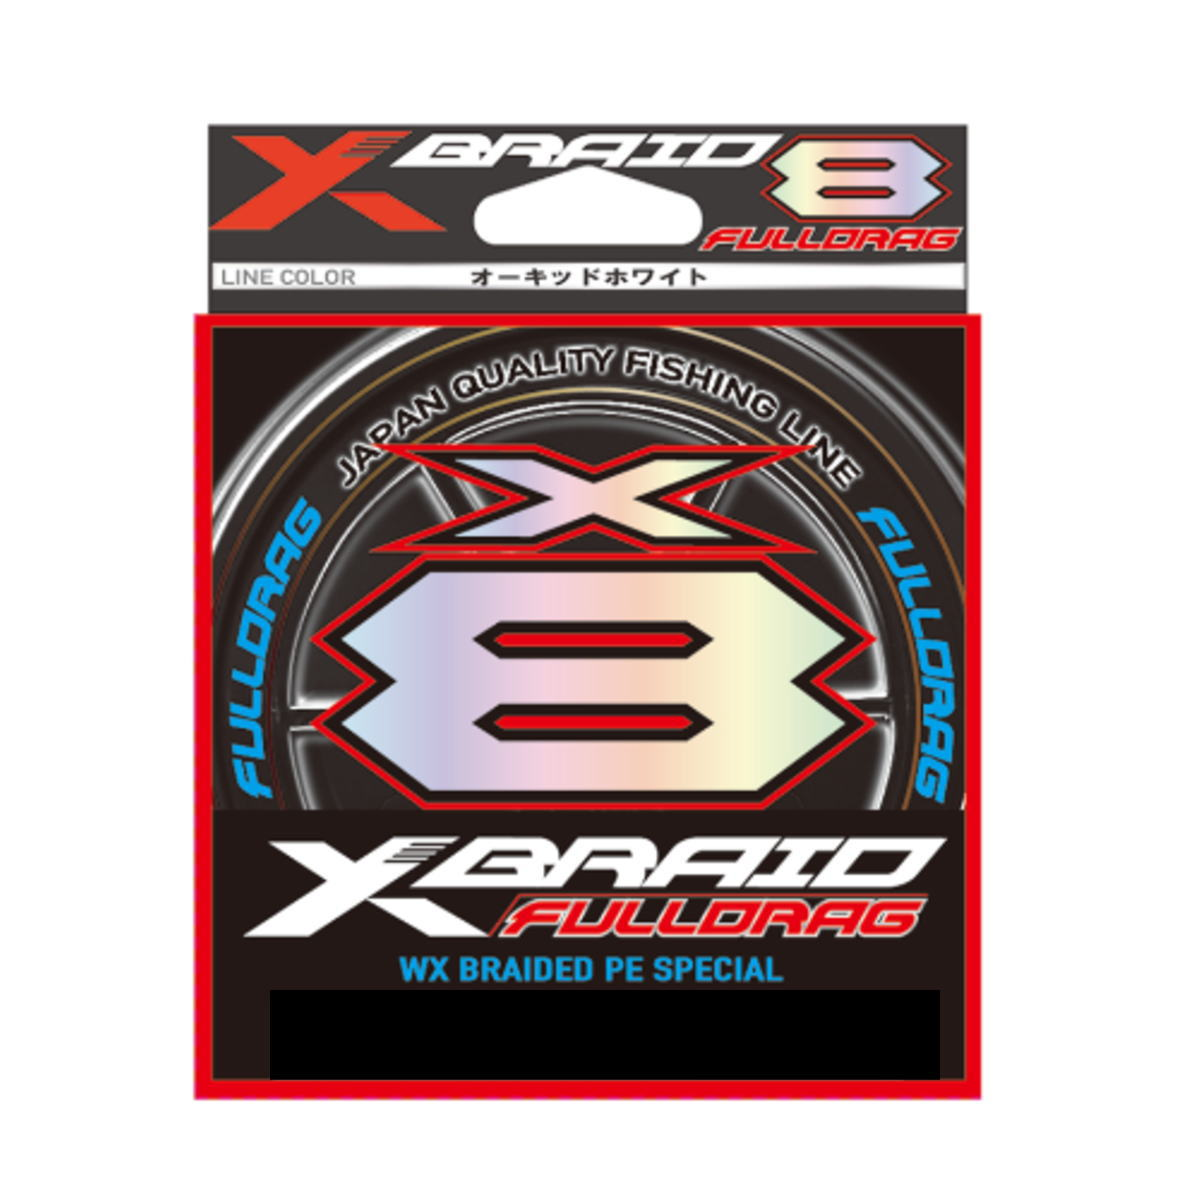 YGK Xブレイド フルドラグ X8 300m 4号 (70lb) 【メール便 / 代引不可】